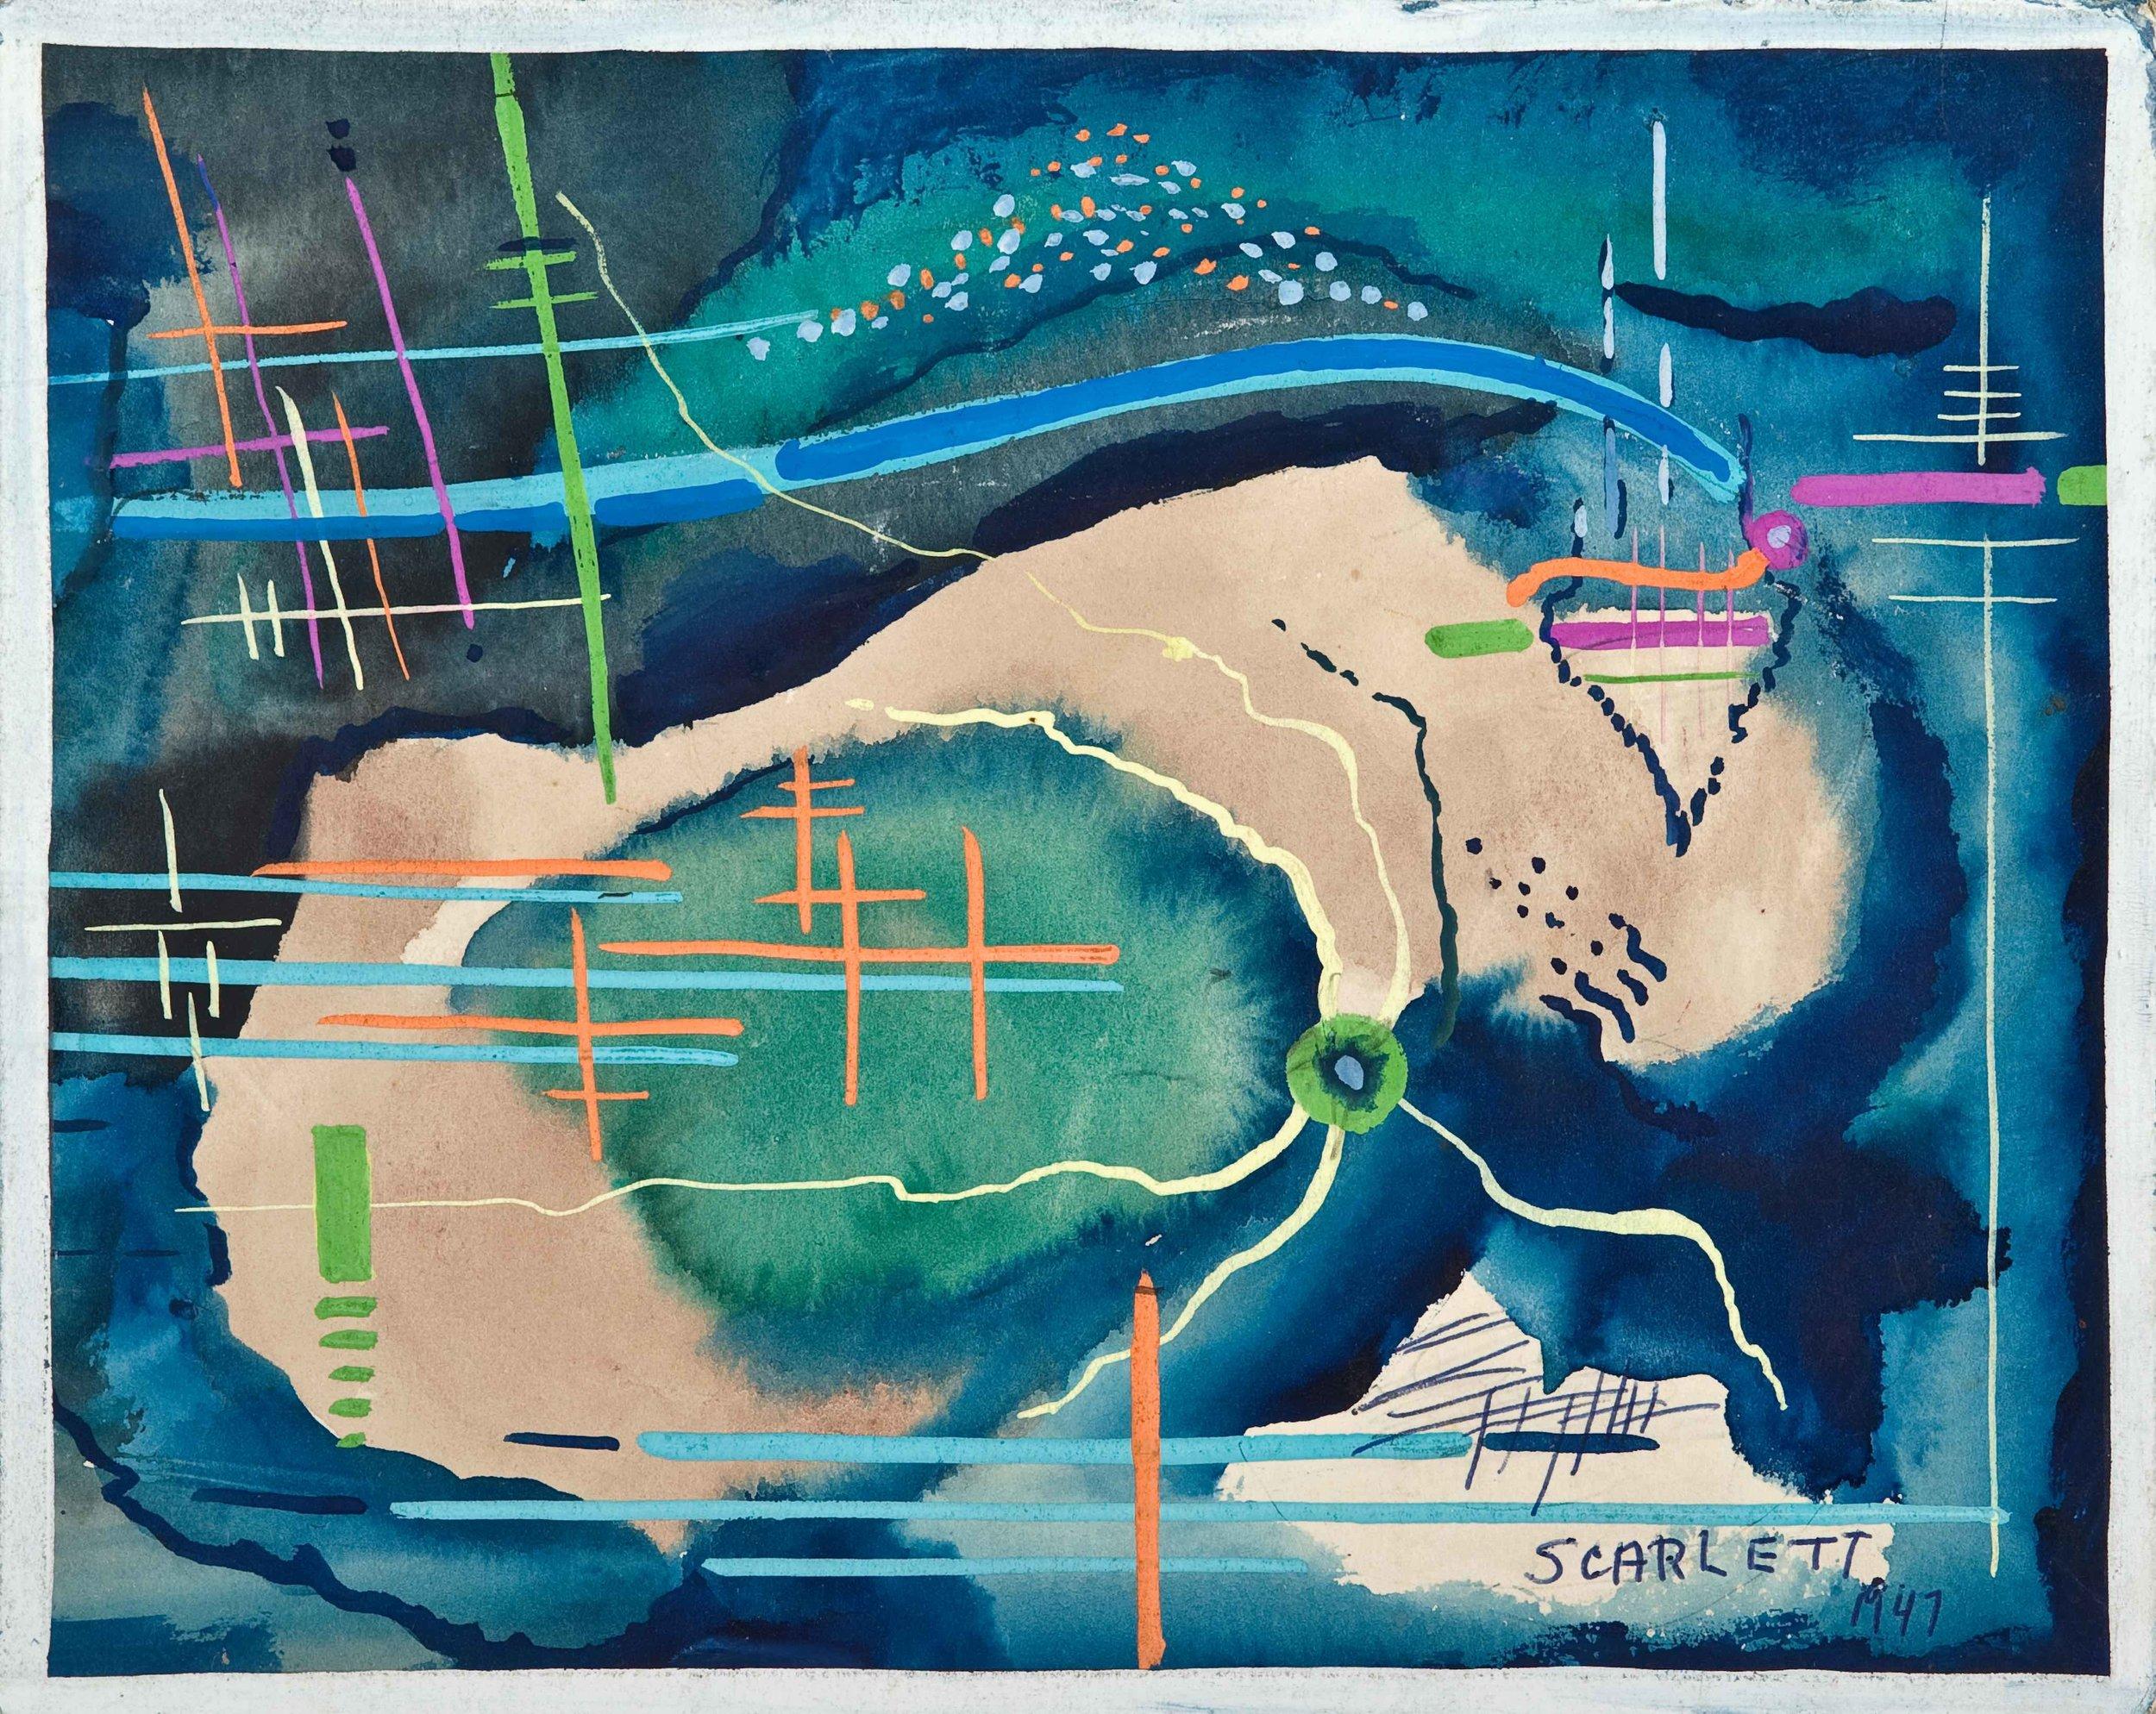 "Rolph Scarlett,(RS174), 1947, graphite, ink and gouache on illustration board, 16 5/8 x 17 7/8"" framed"